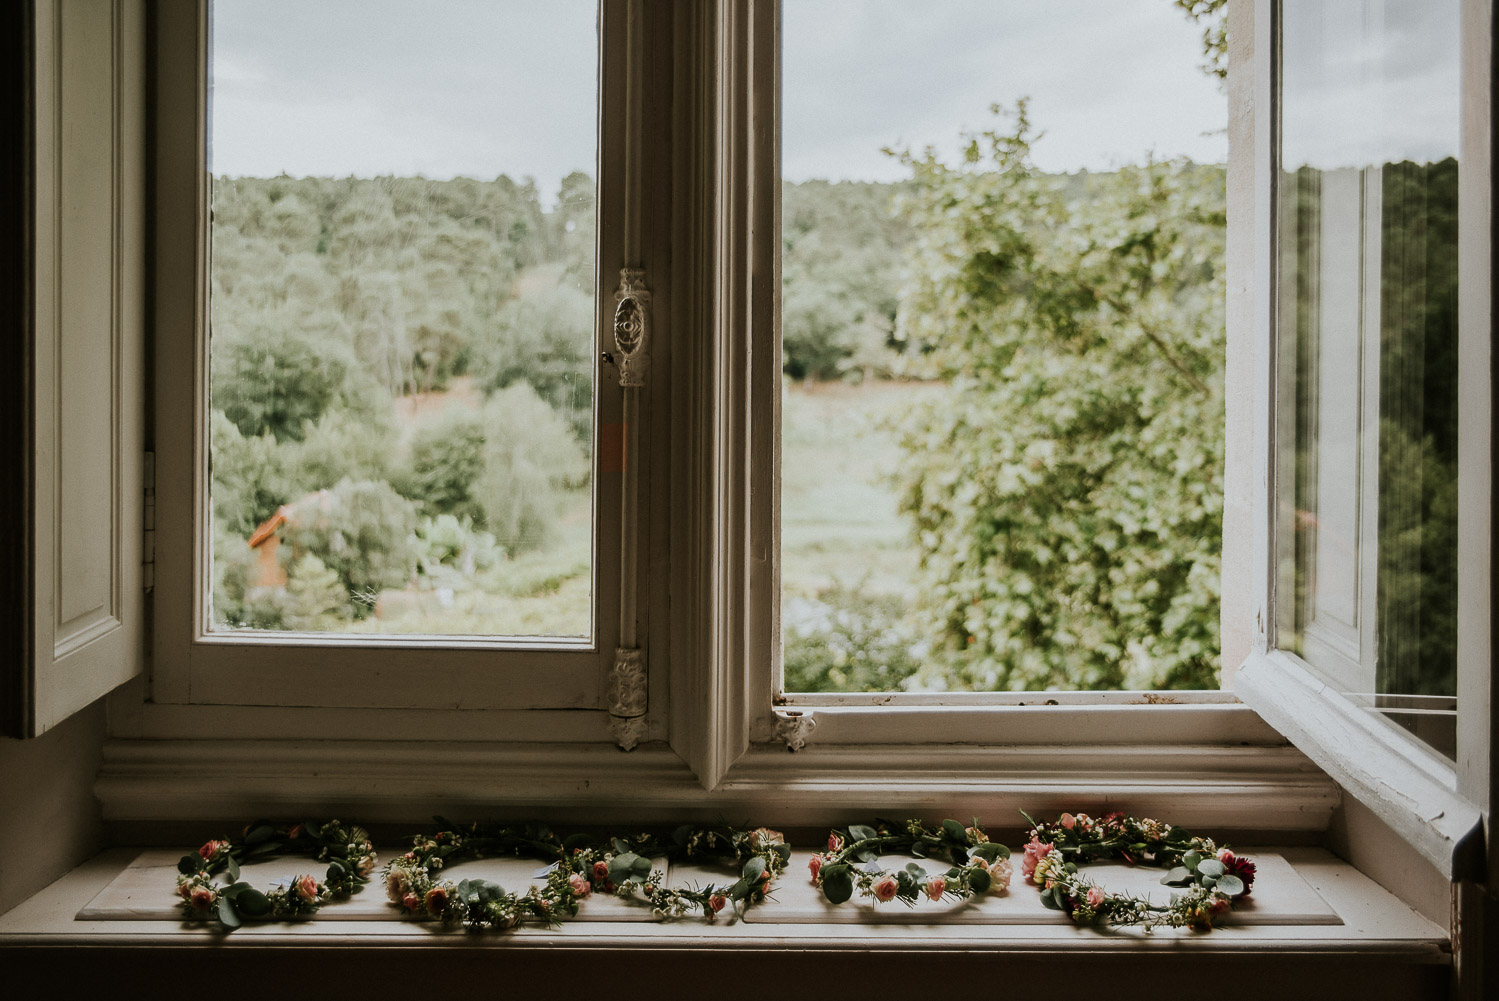 chateau_de_lisse_gers_wedding_katy_webb_photography_france_UK29